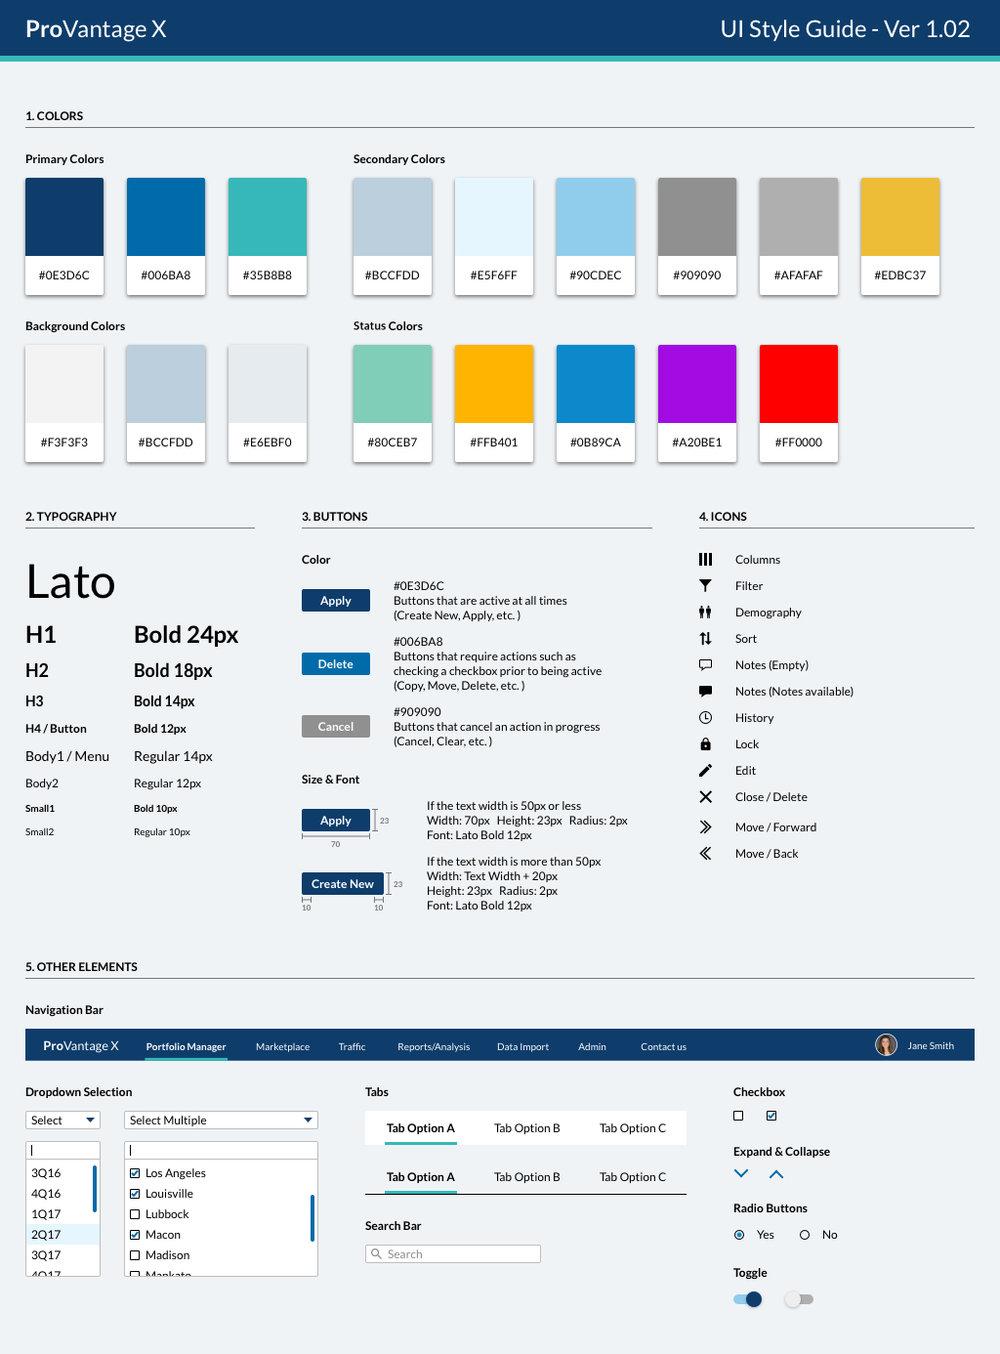 PVX Style Guide 1.02.jpg